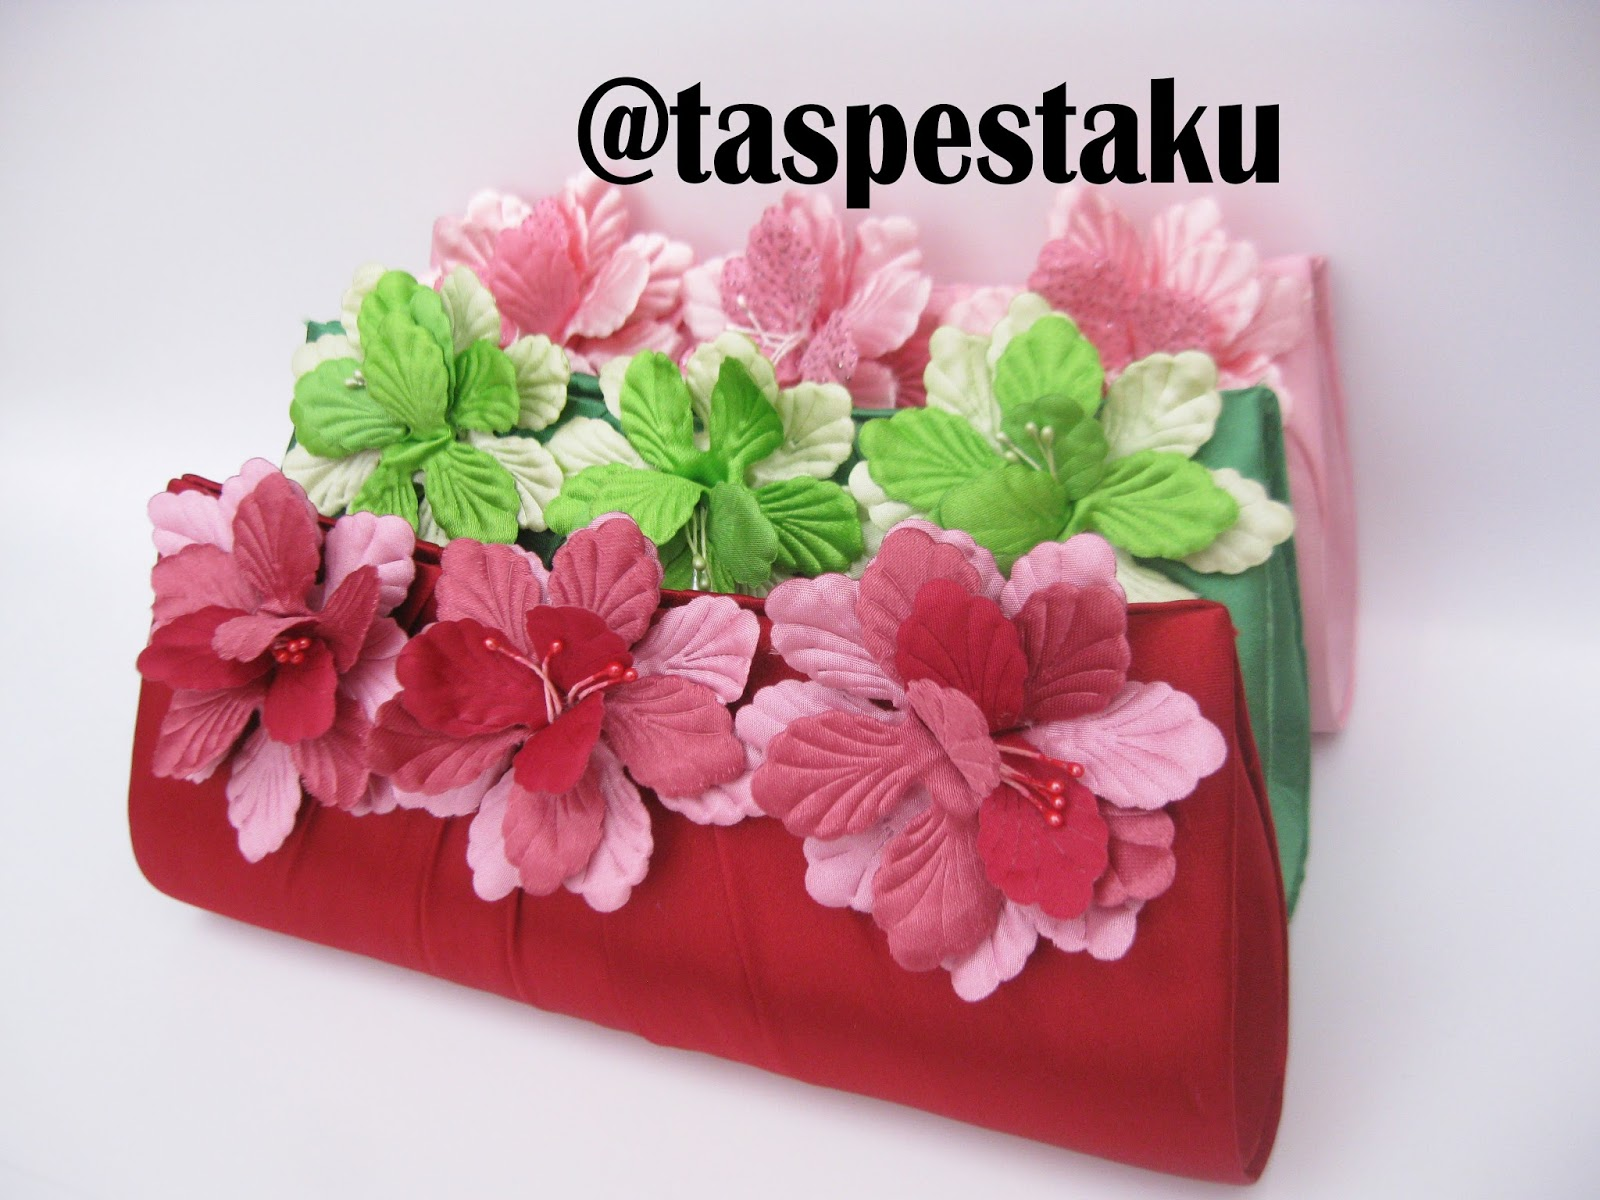 Tas Pesta Bunga Cantik dan Unik Koleksi Tas Pesta Ku. TAS PESTA - CLUTCH BAG  ... b453e08a42